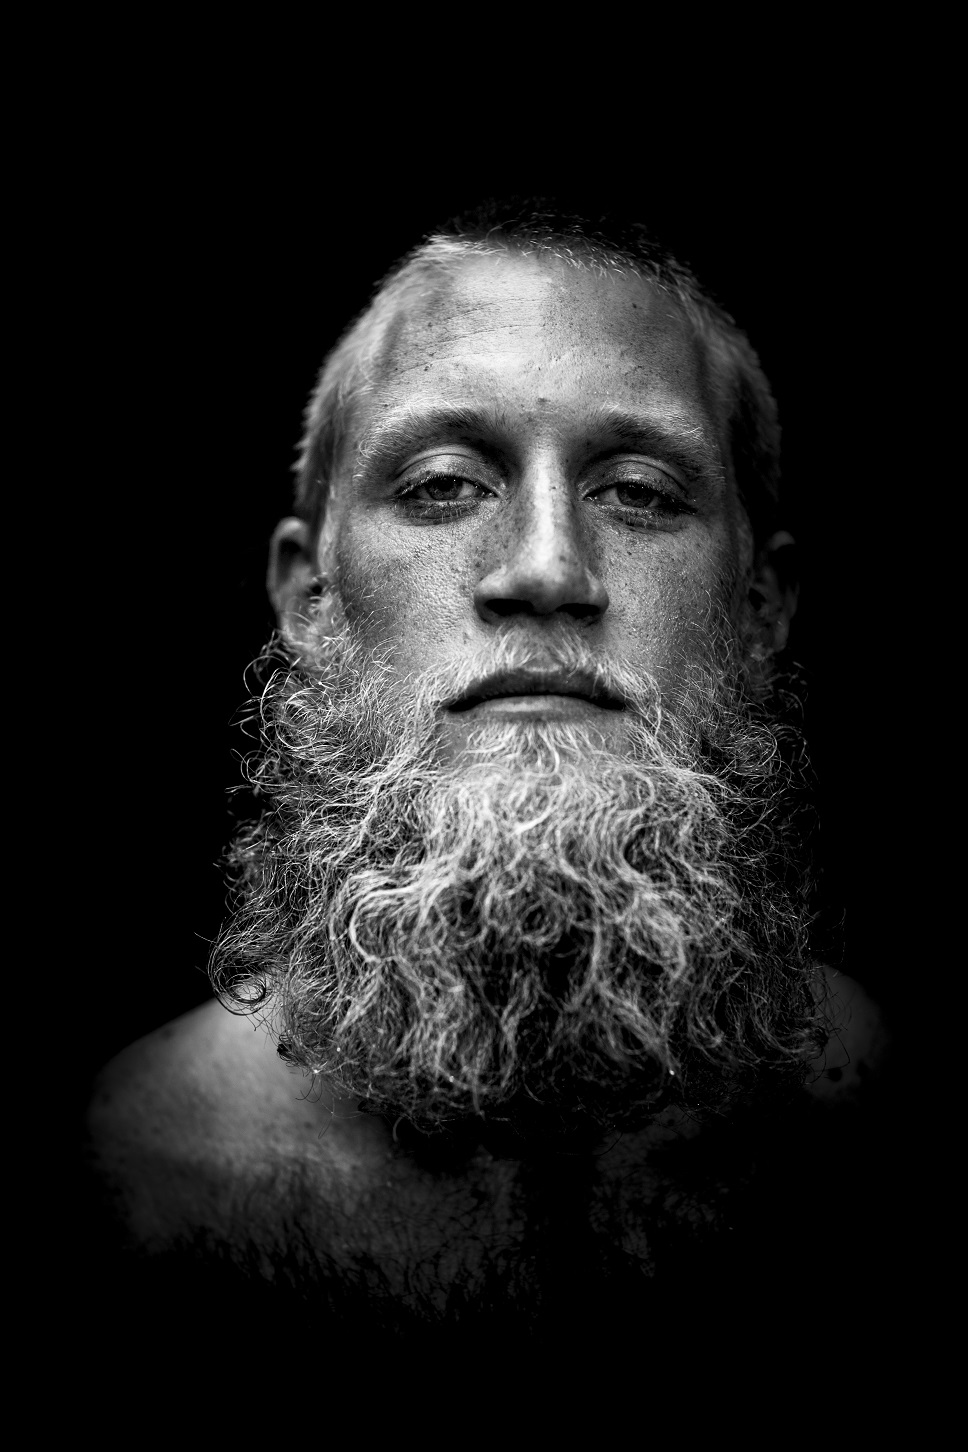 oahu headshot photographer man black & white portrait